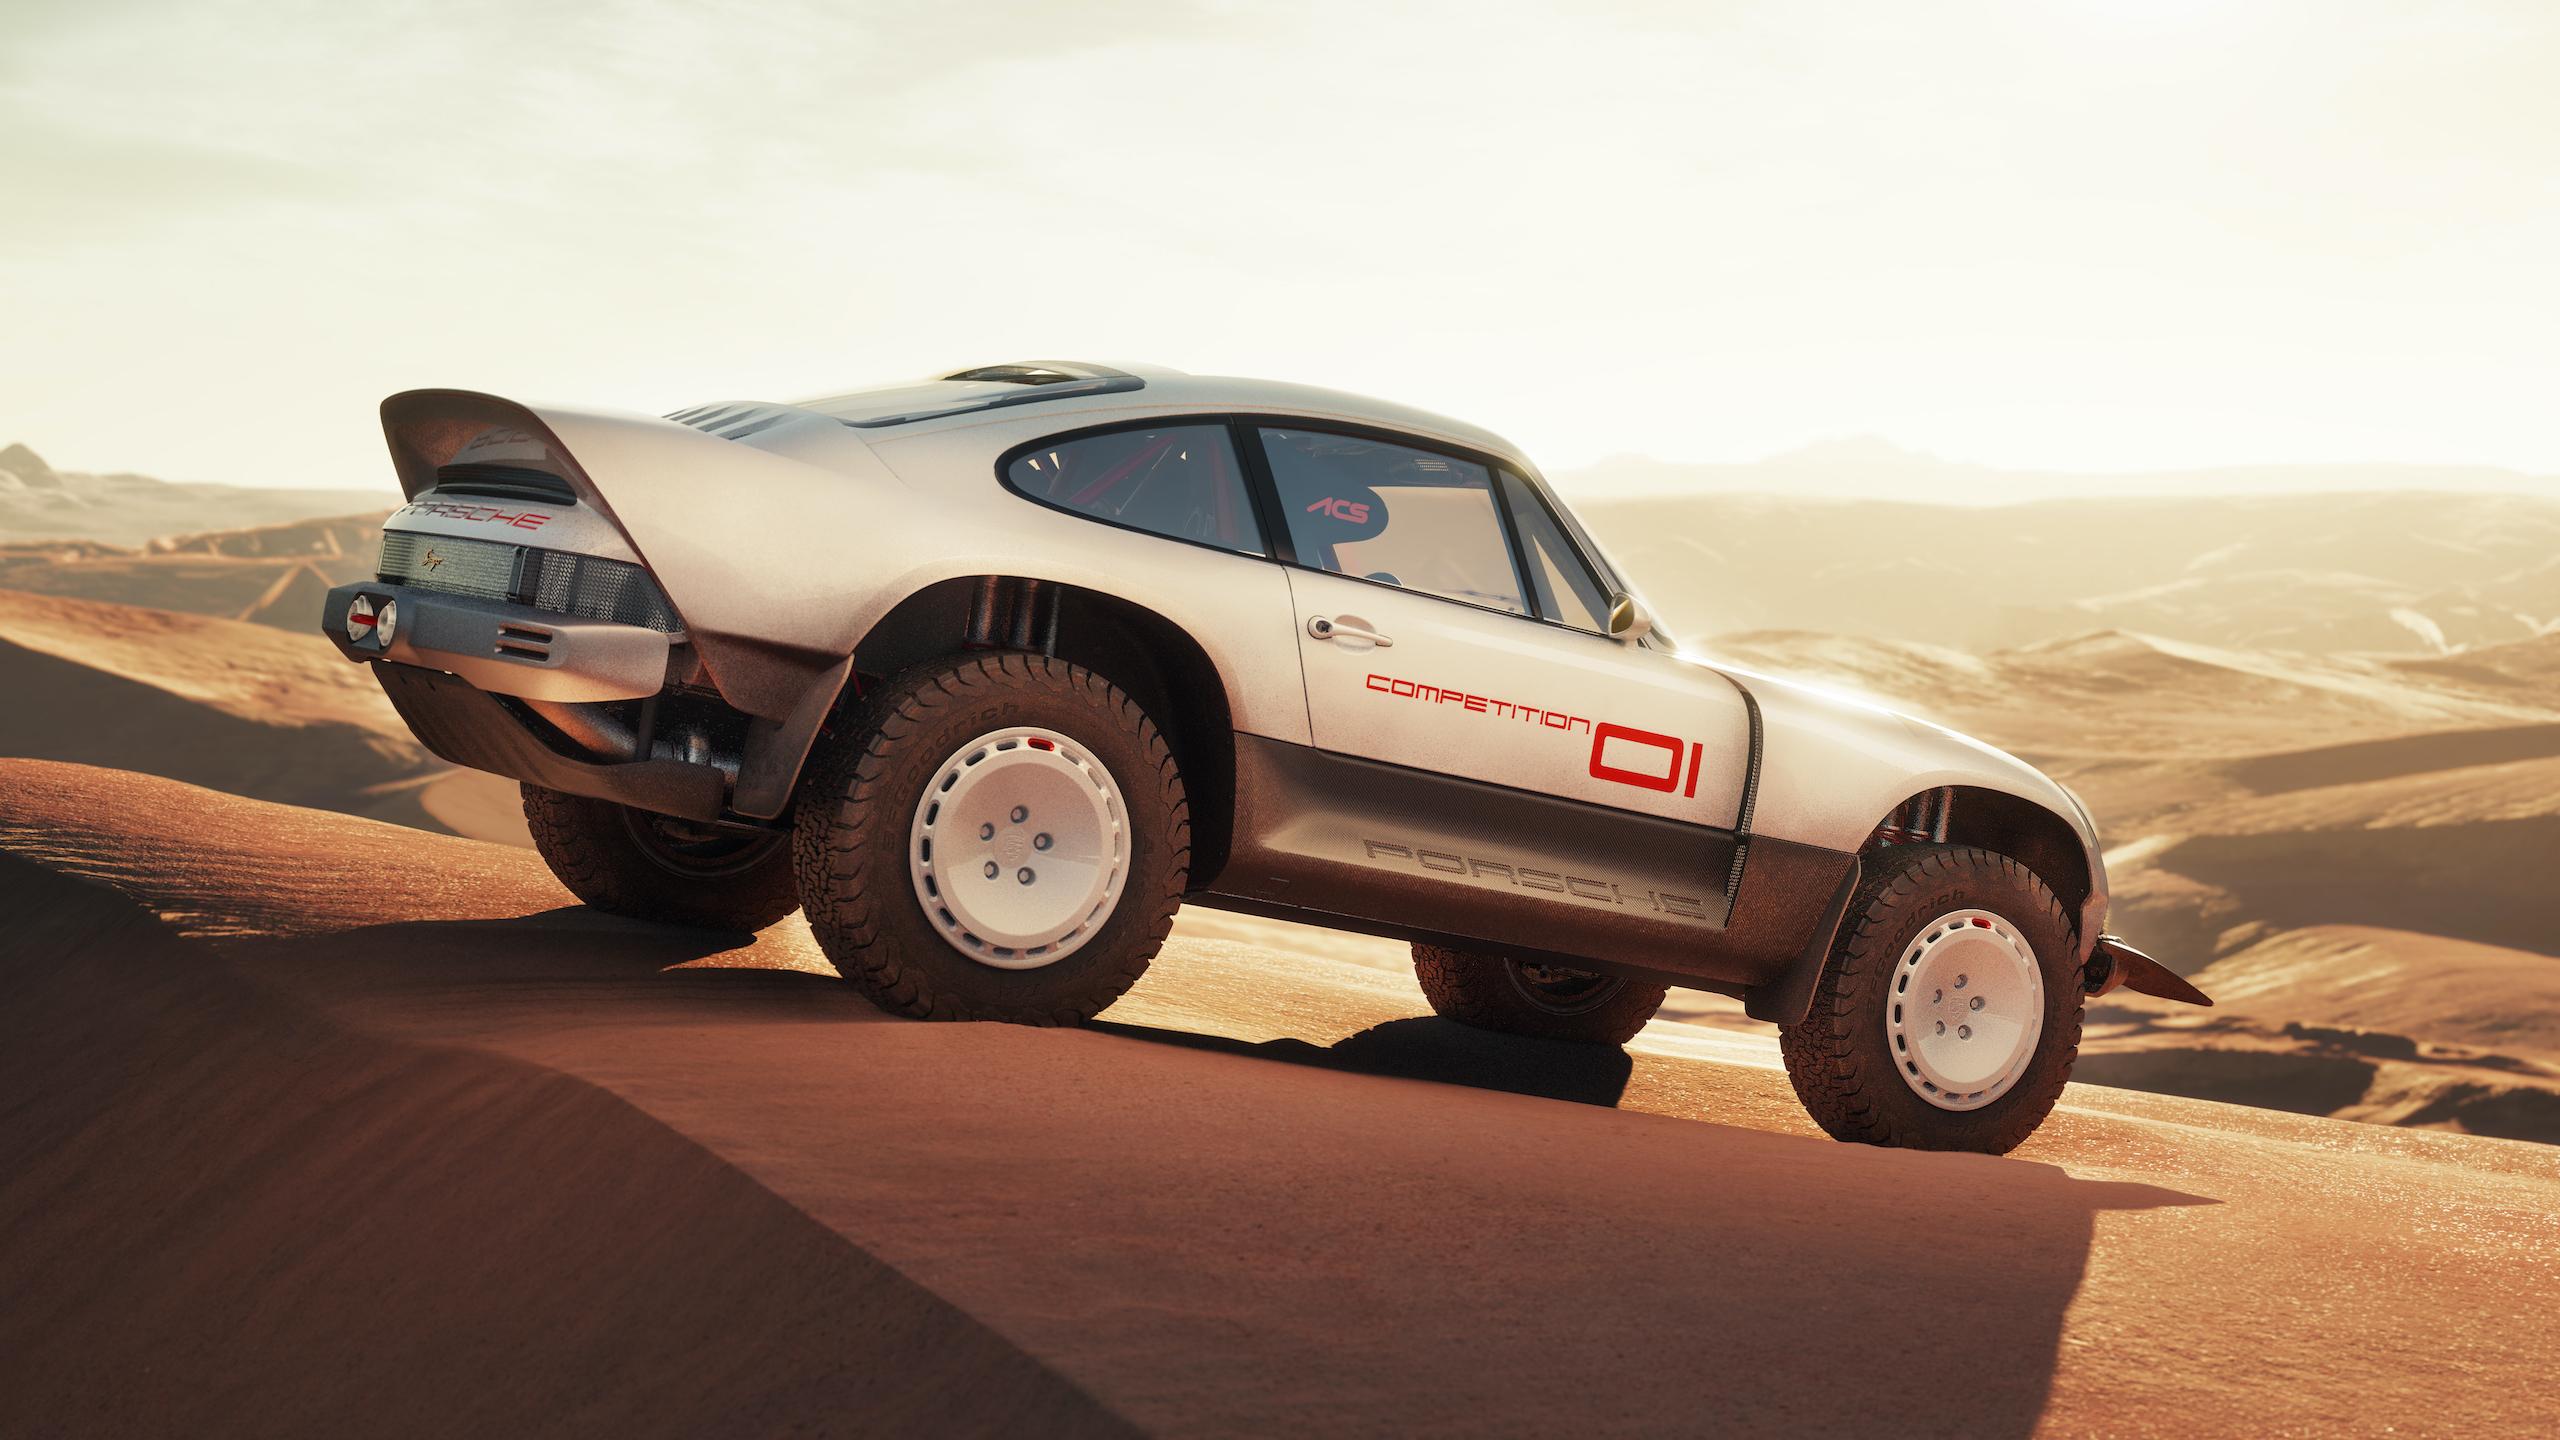 We can't stop staring at the Singer Paris-Dakar 911